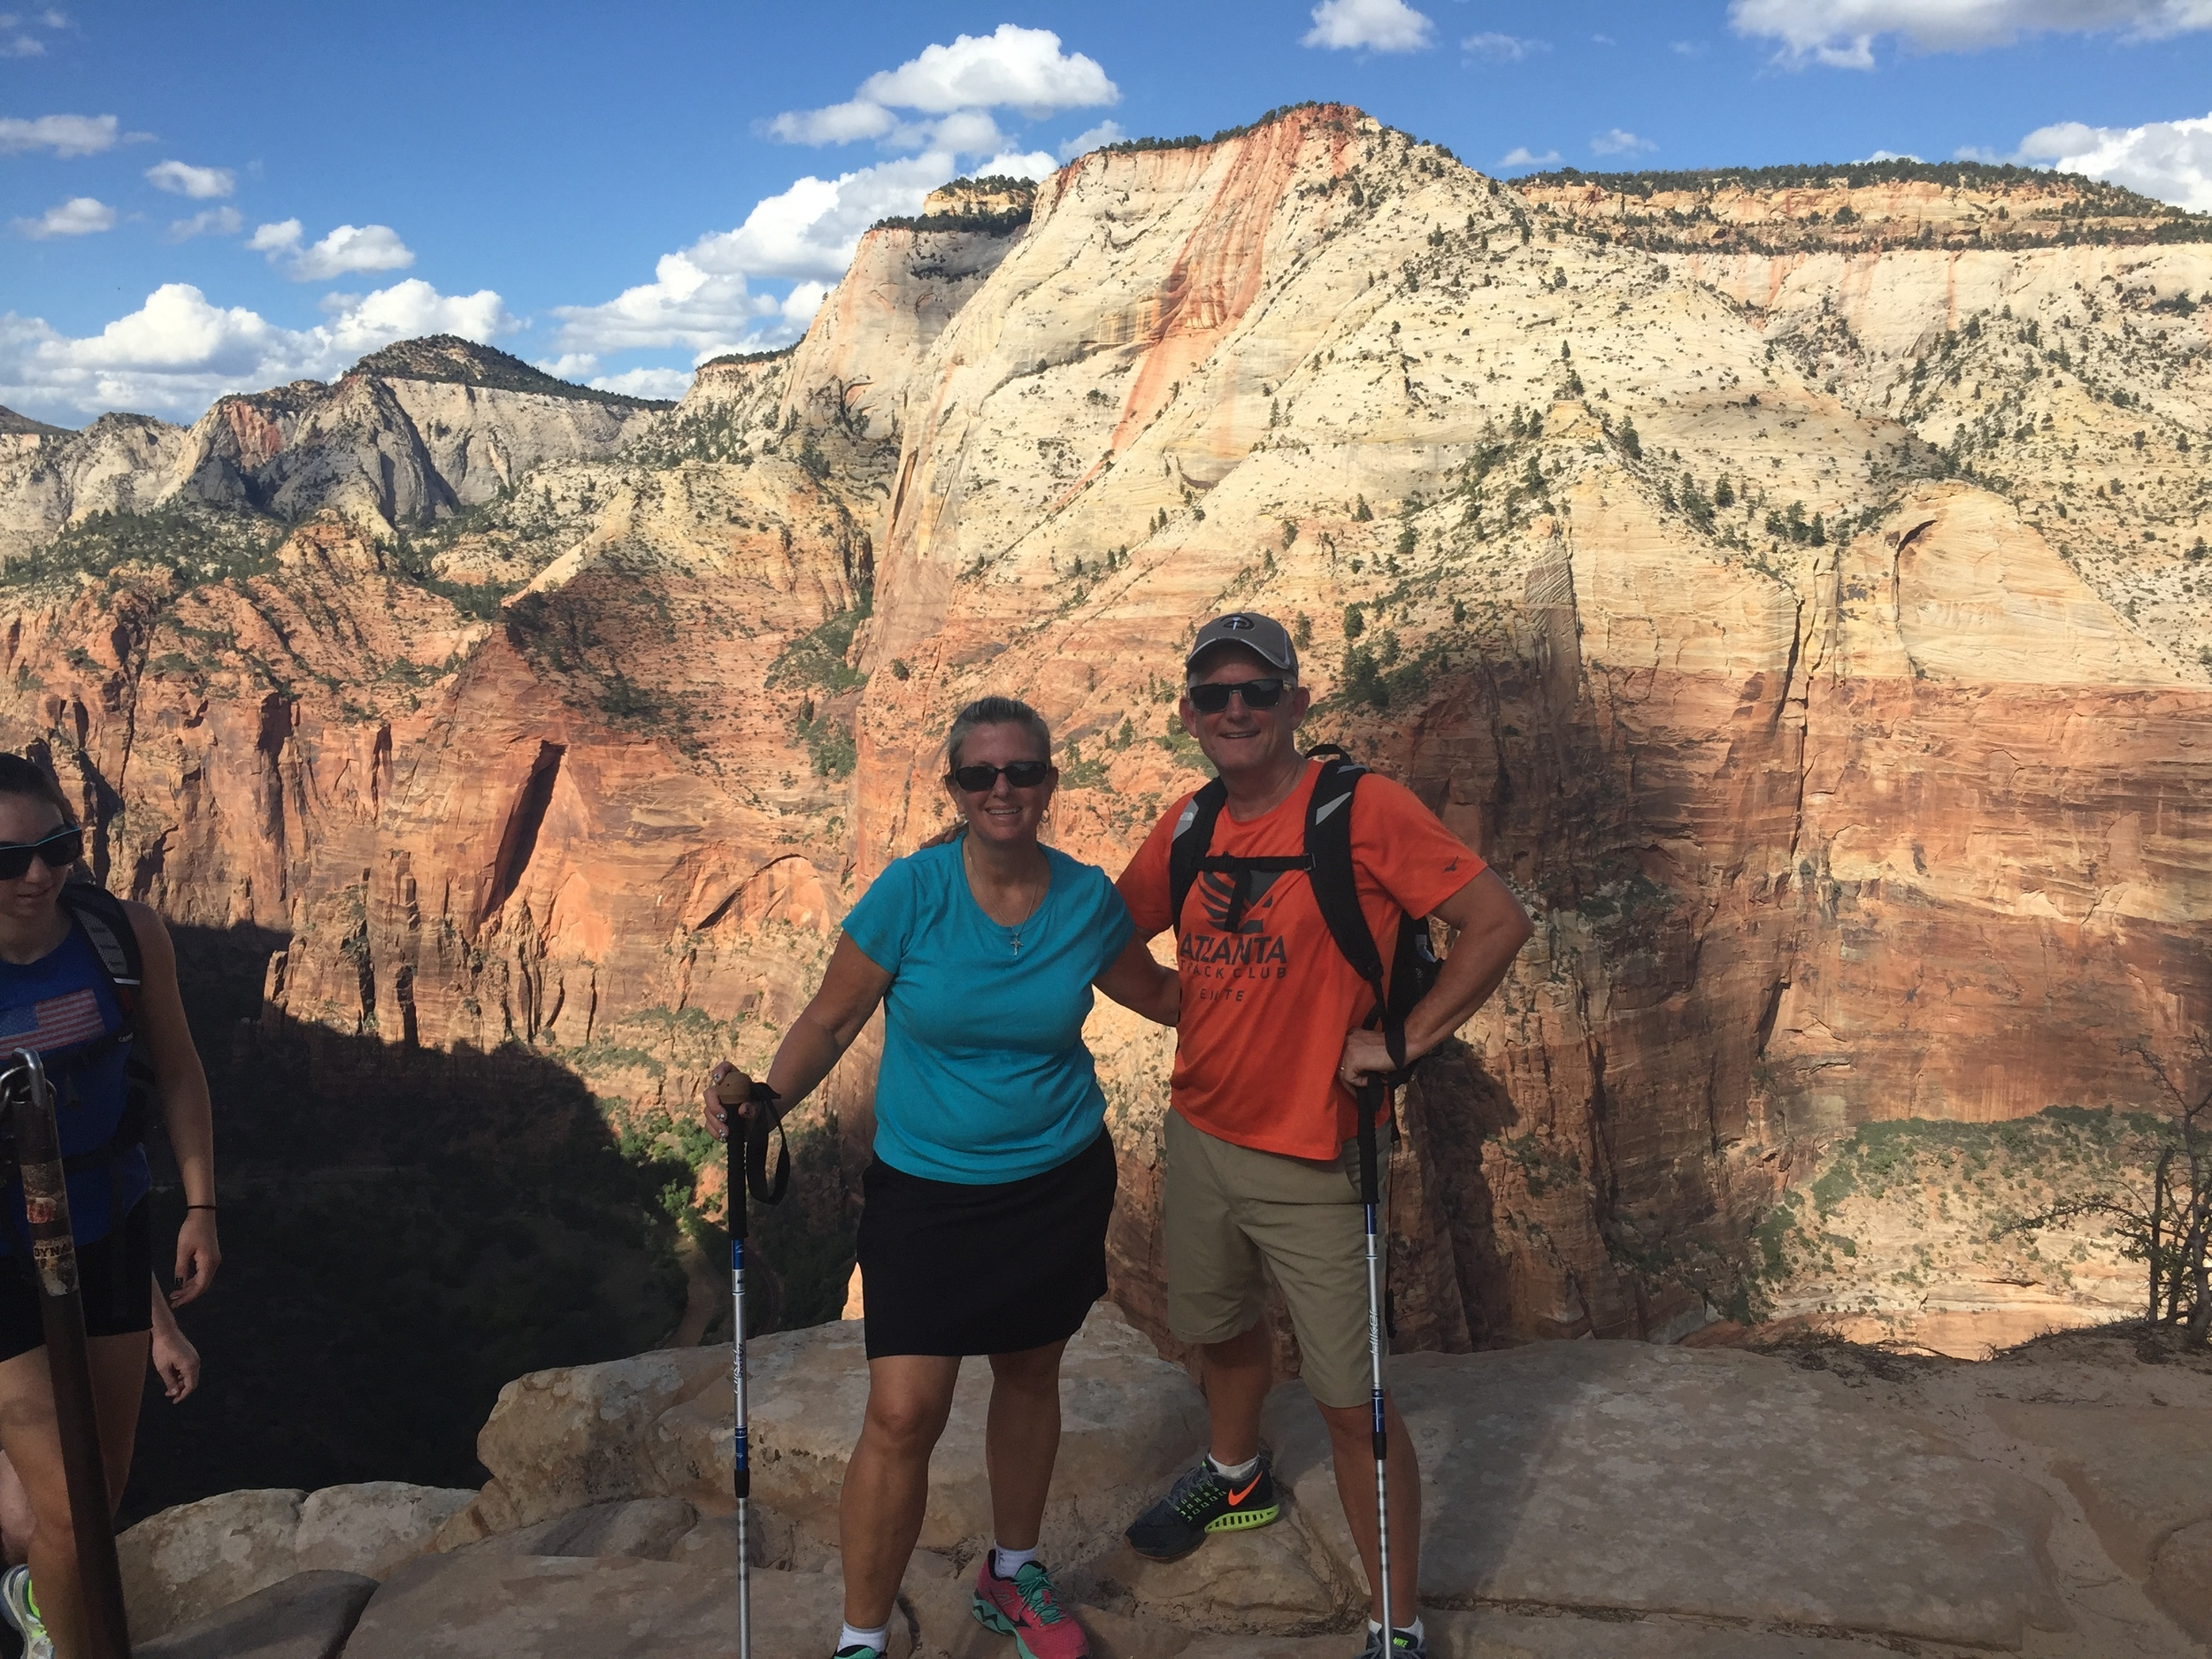 Summit - Angel's Landing - Zion National Park